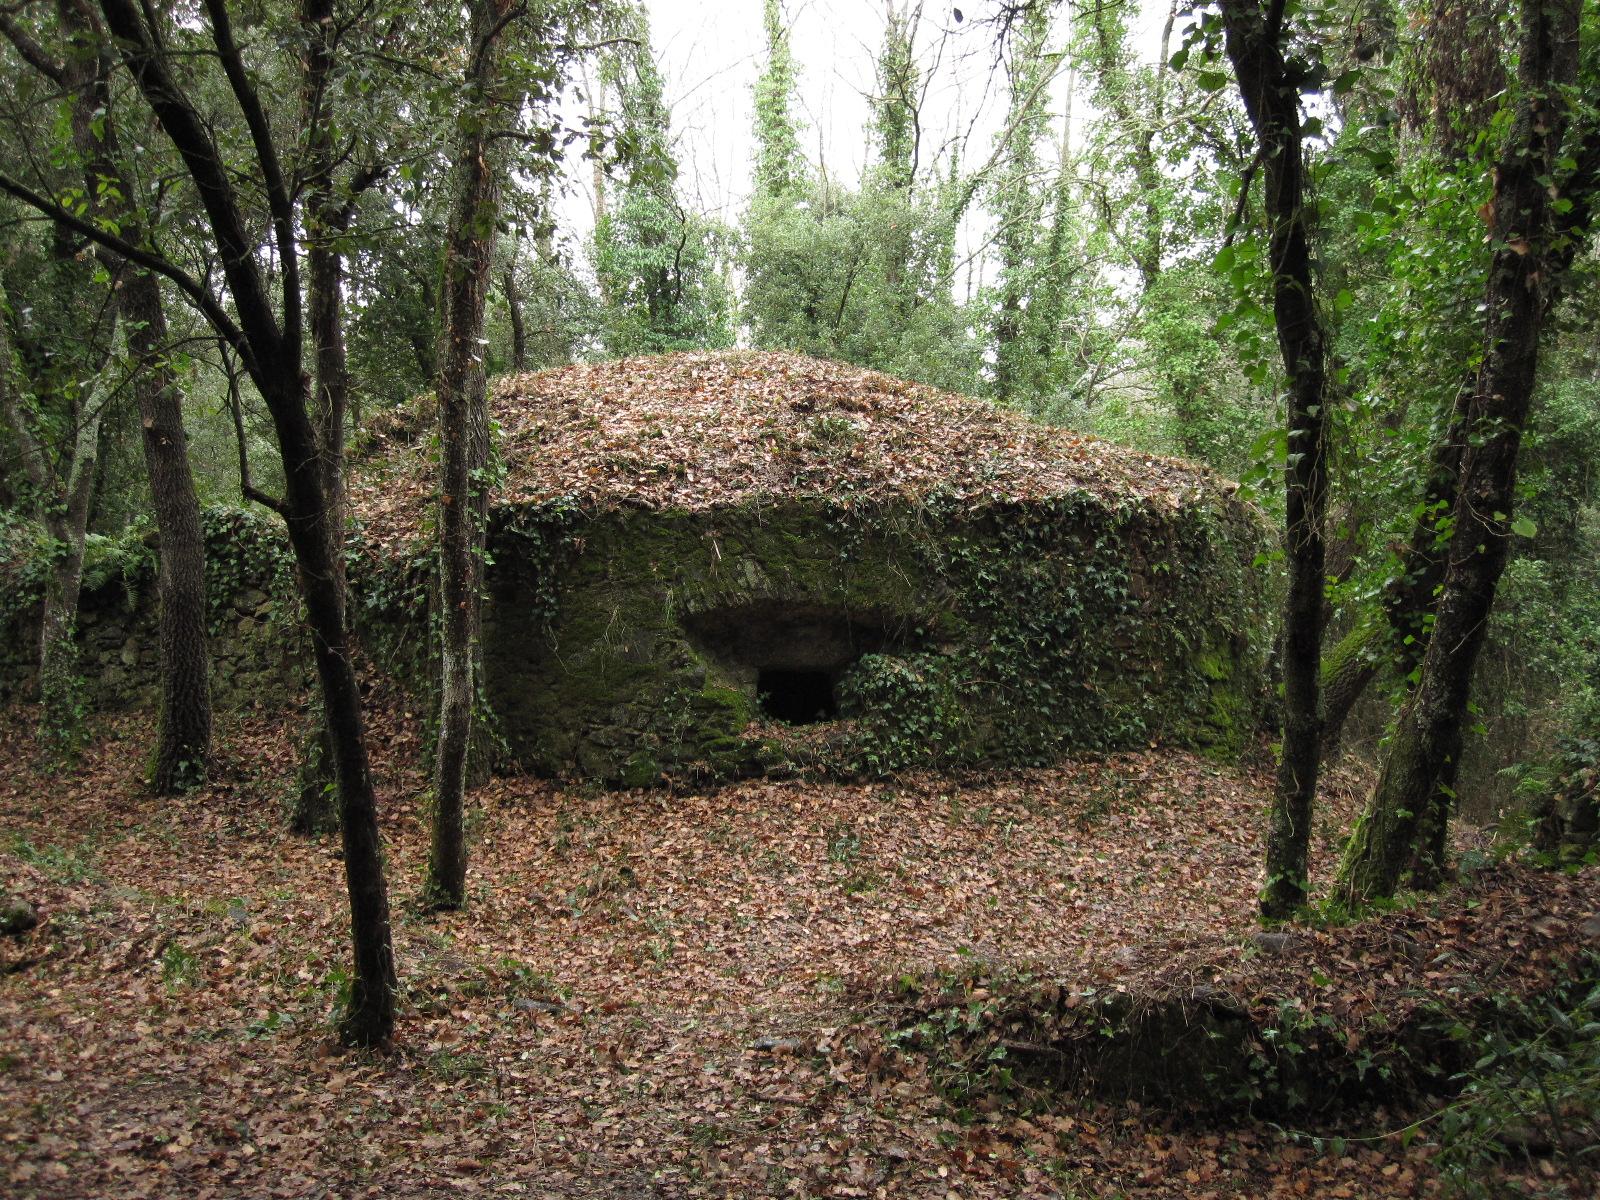 Pou de glaç cobert de la Font d'en Salomó, Sant Pol. (La Bisbal d'Empordà)